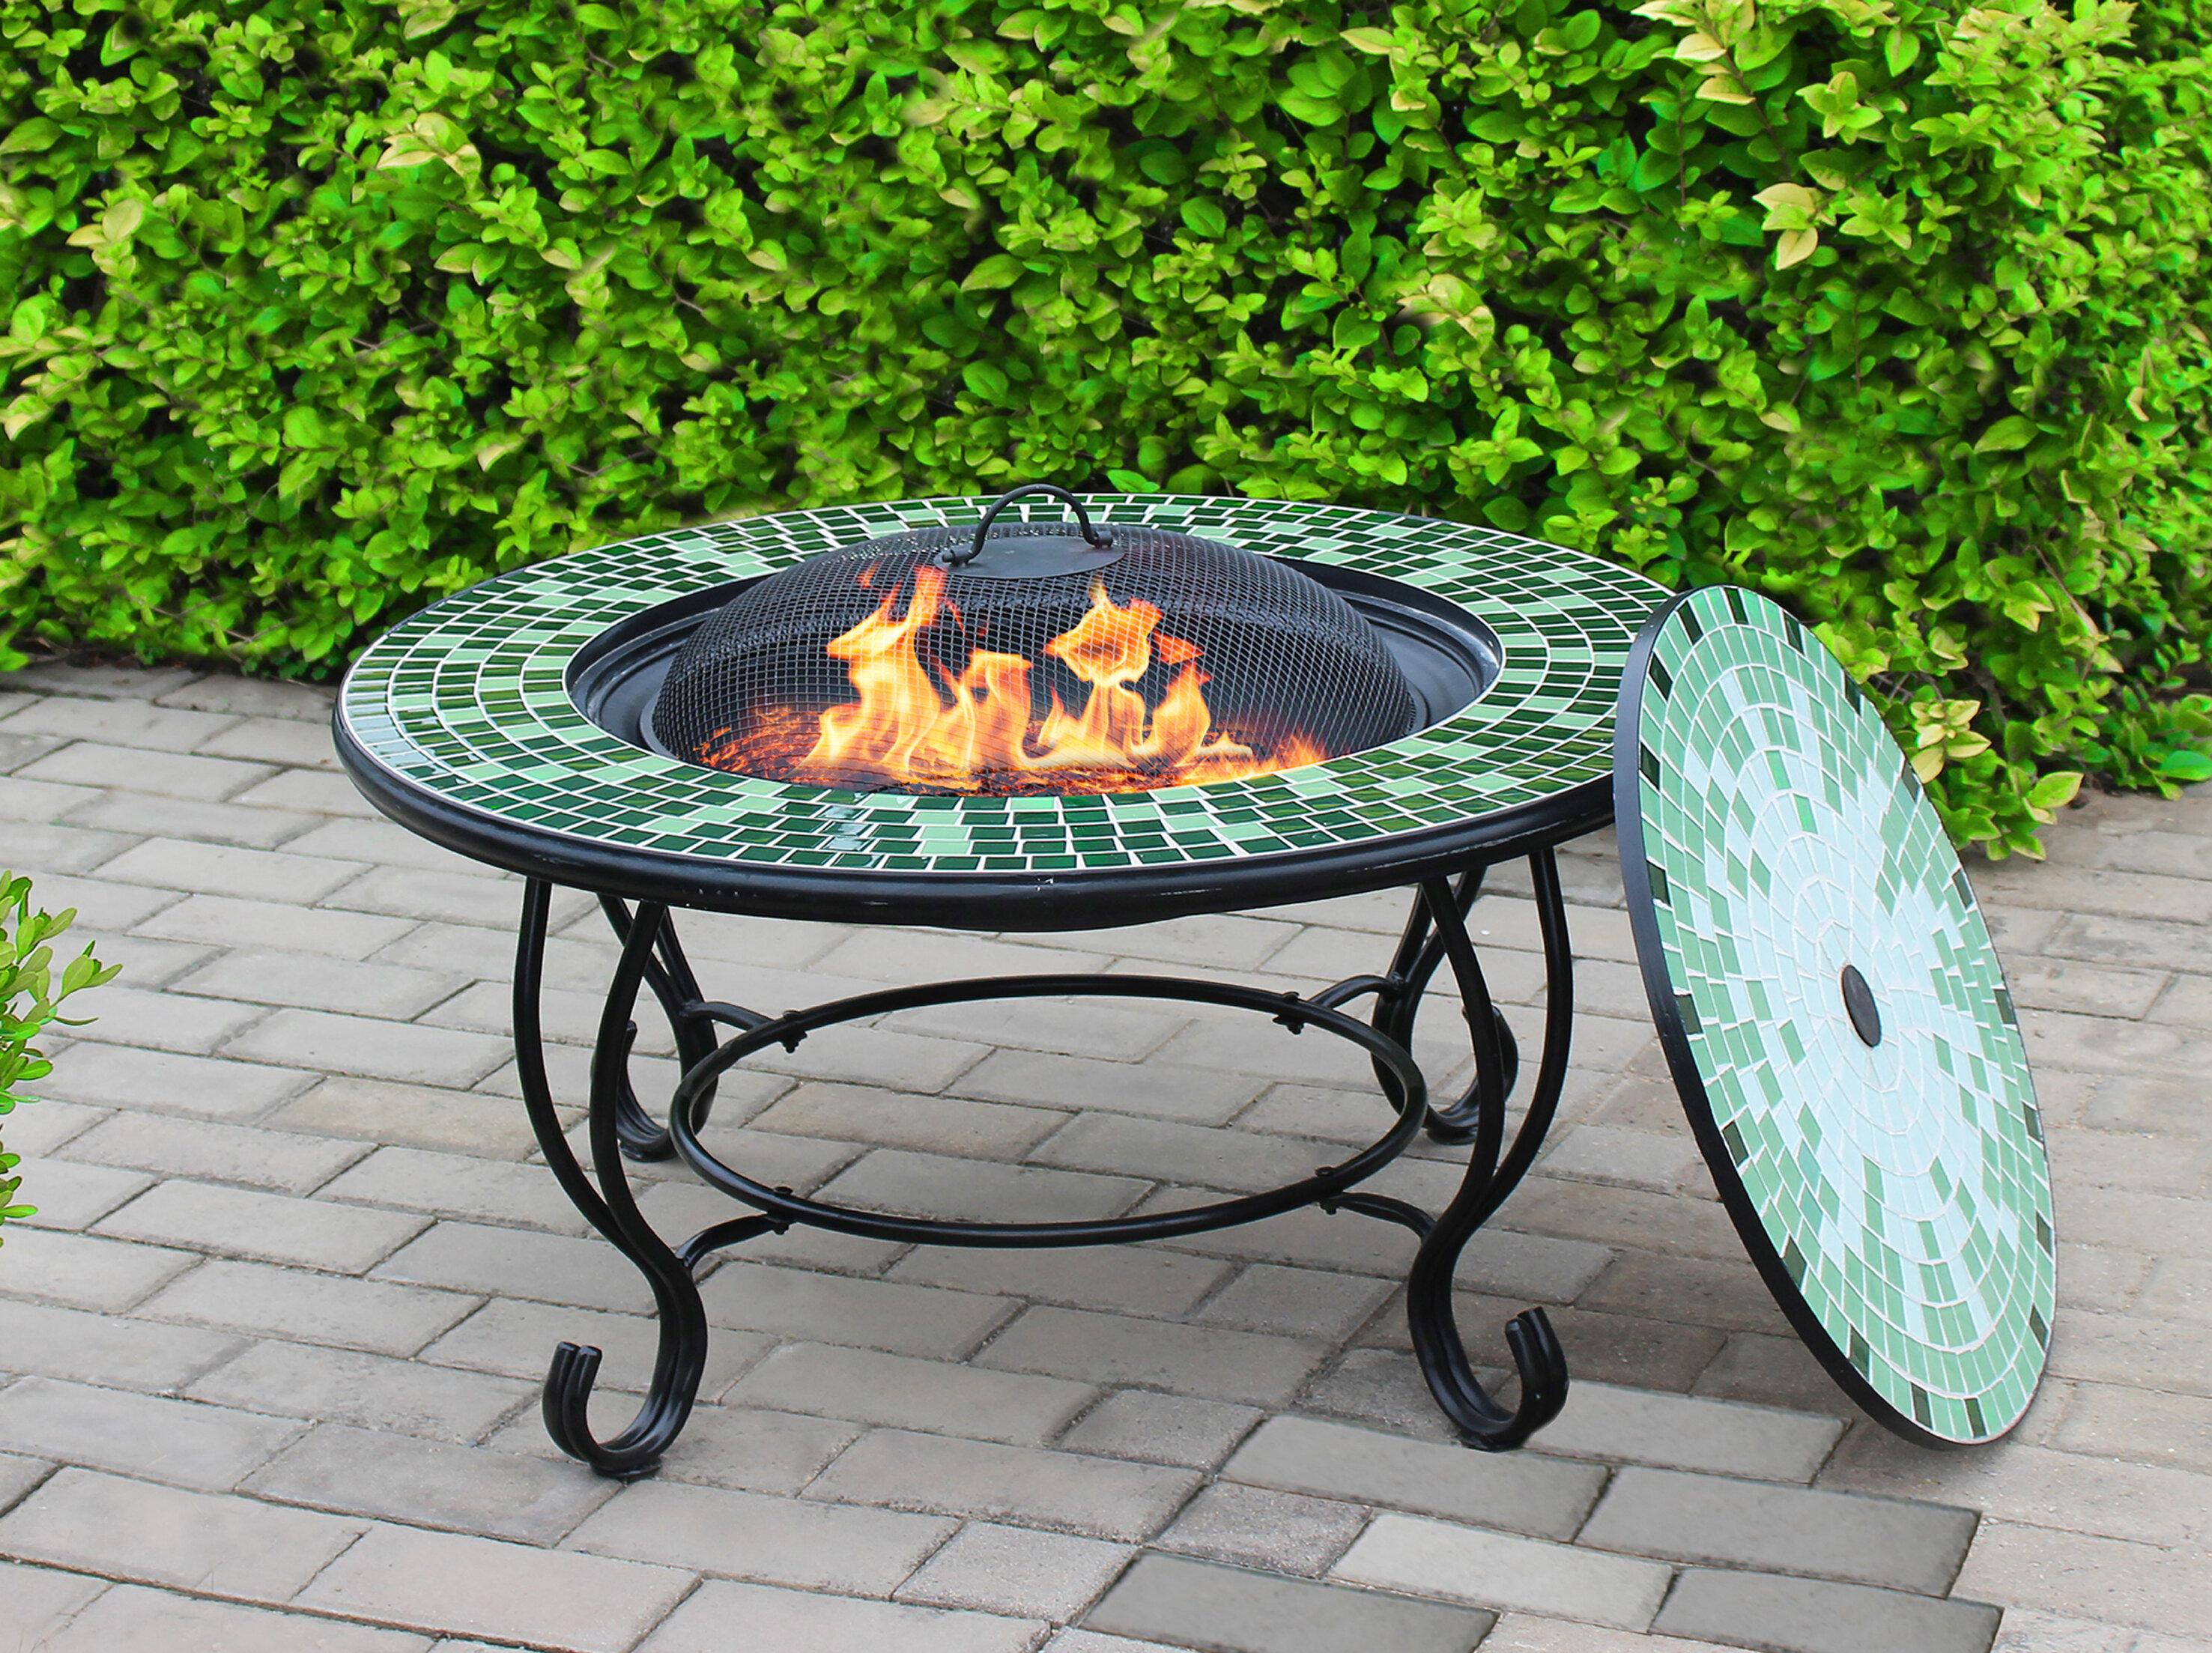 Barbecue Grill Tisch Guss Aluminium Hof Garten Freizeit BBQ